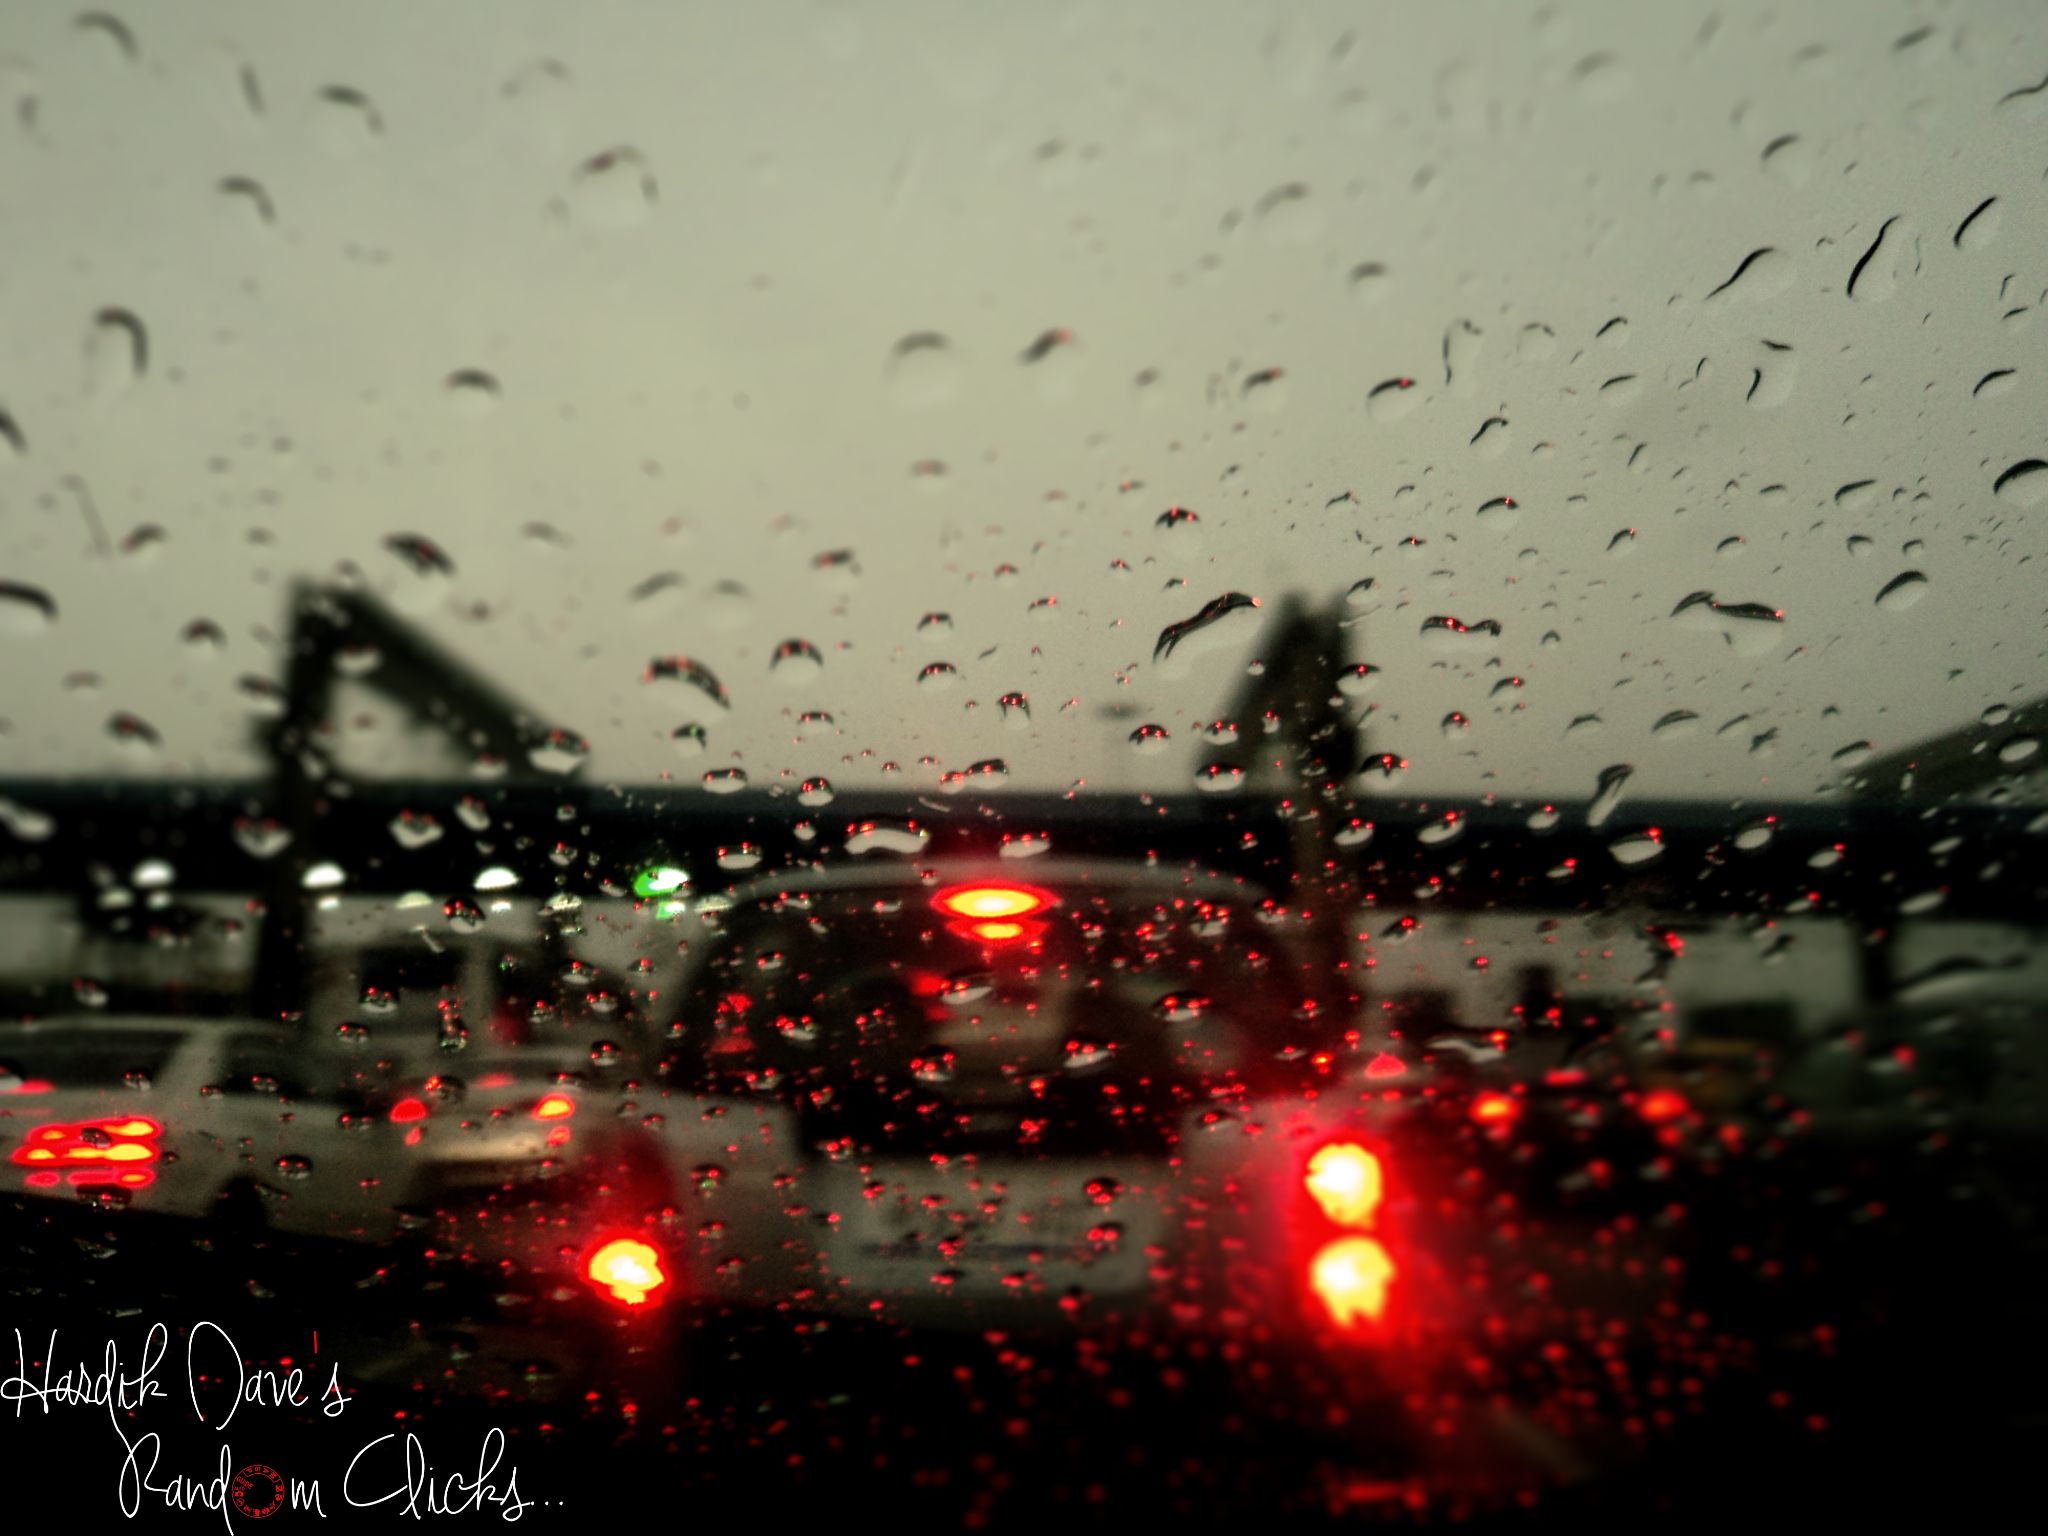 Rain Drops by Hardik Dave